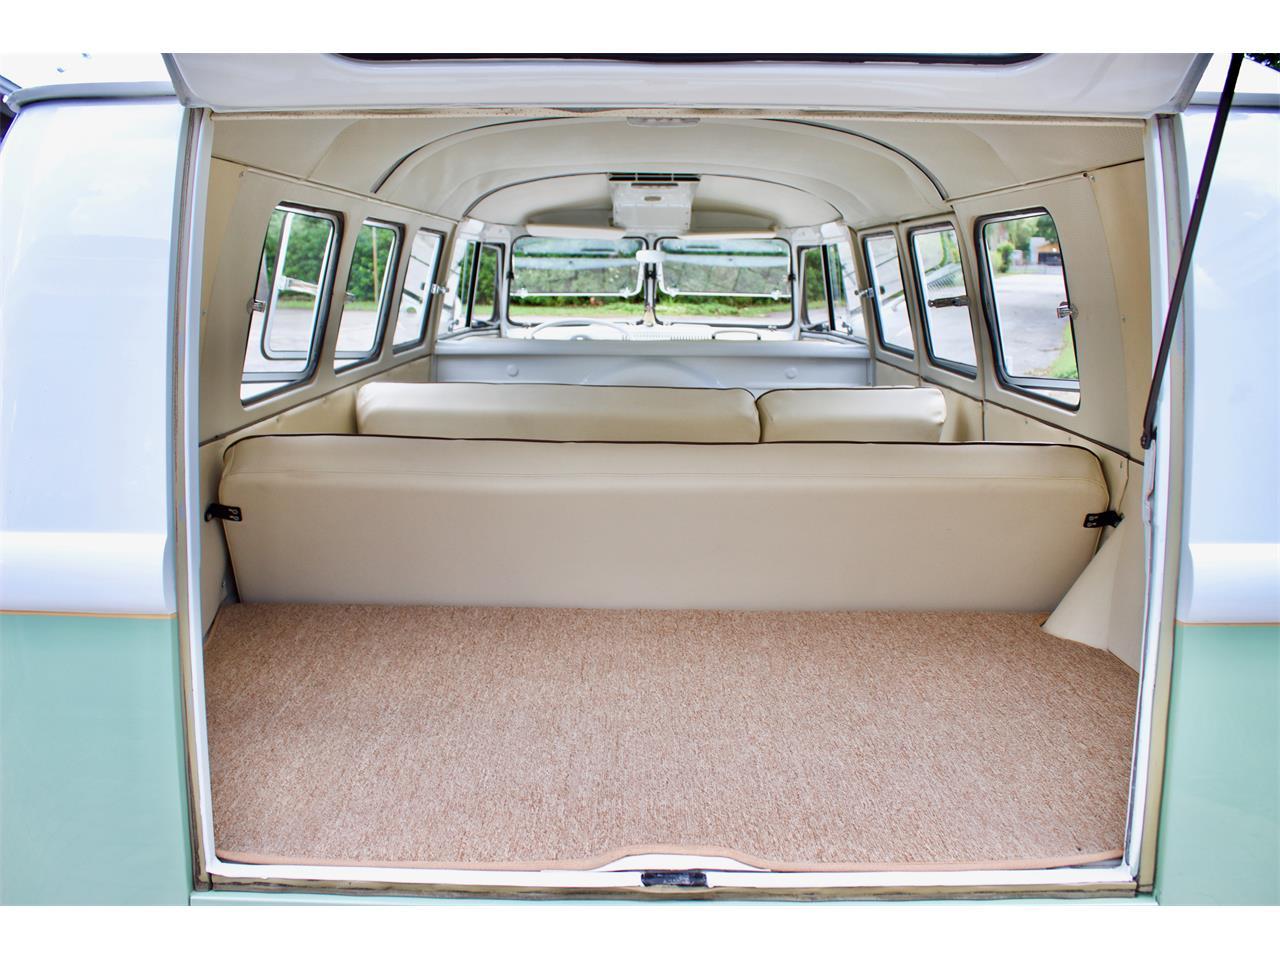 Large Picture of Classic 1962 Volkswagen Bus located in eustis Florida - Q2DH